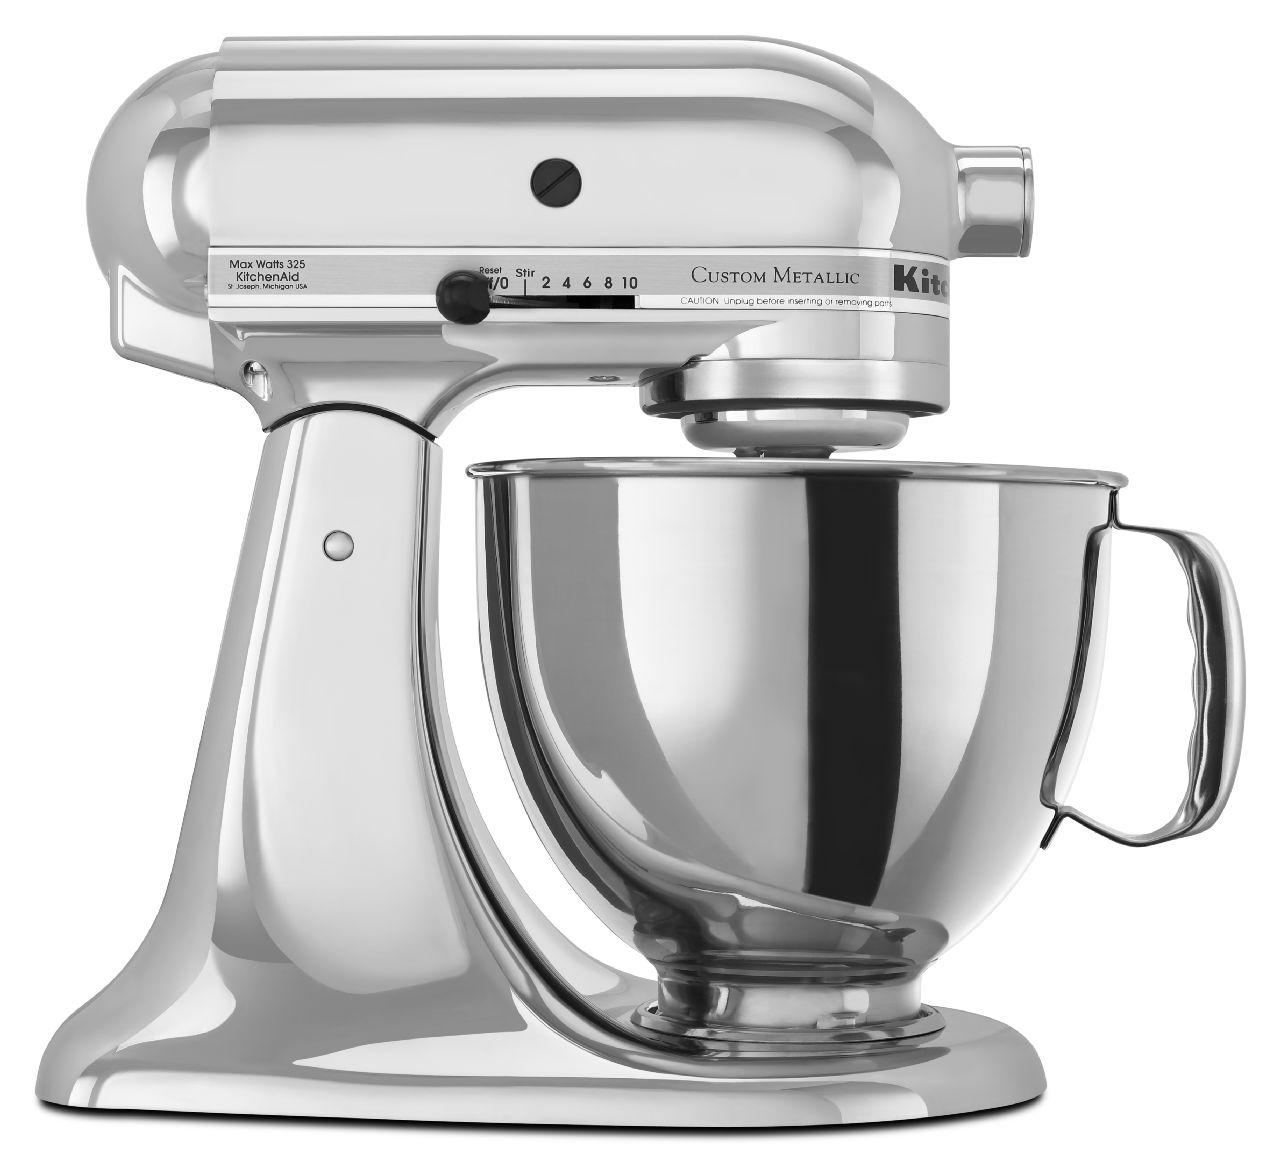 Kitchenaid 174 Artisan 174 Series 5 Qt Tilt Head Stand Mixer